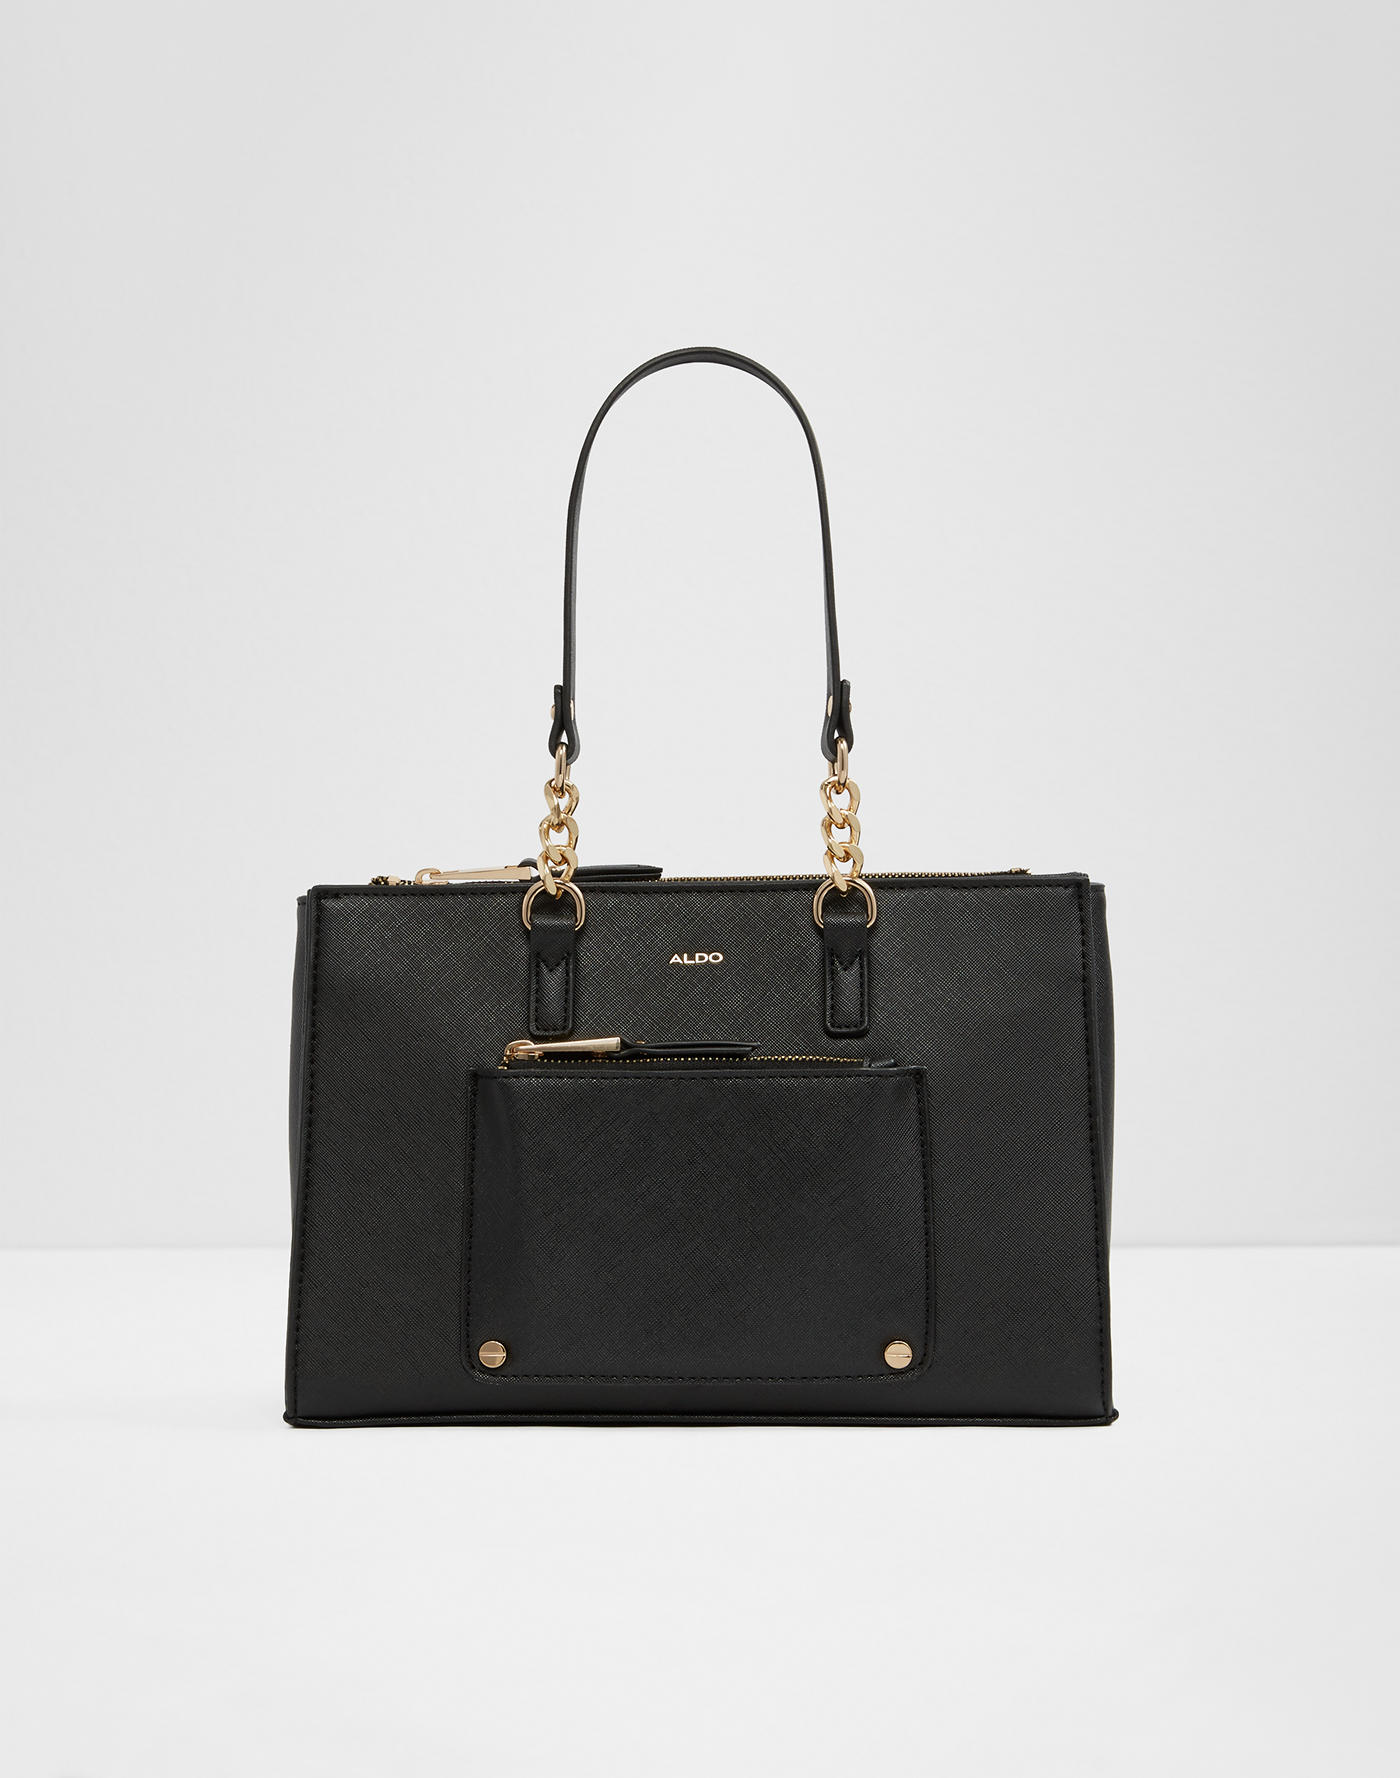 88310c9d1 Women's Tote Bags | Leather Totes for Women | ALDO US | Aldoshoes.com US